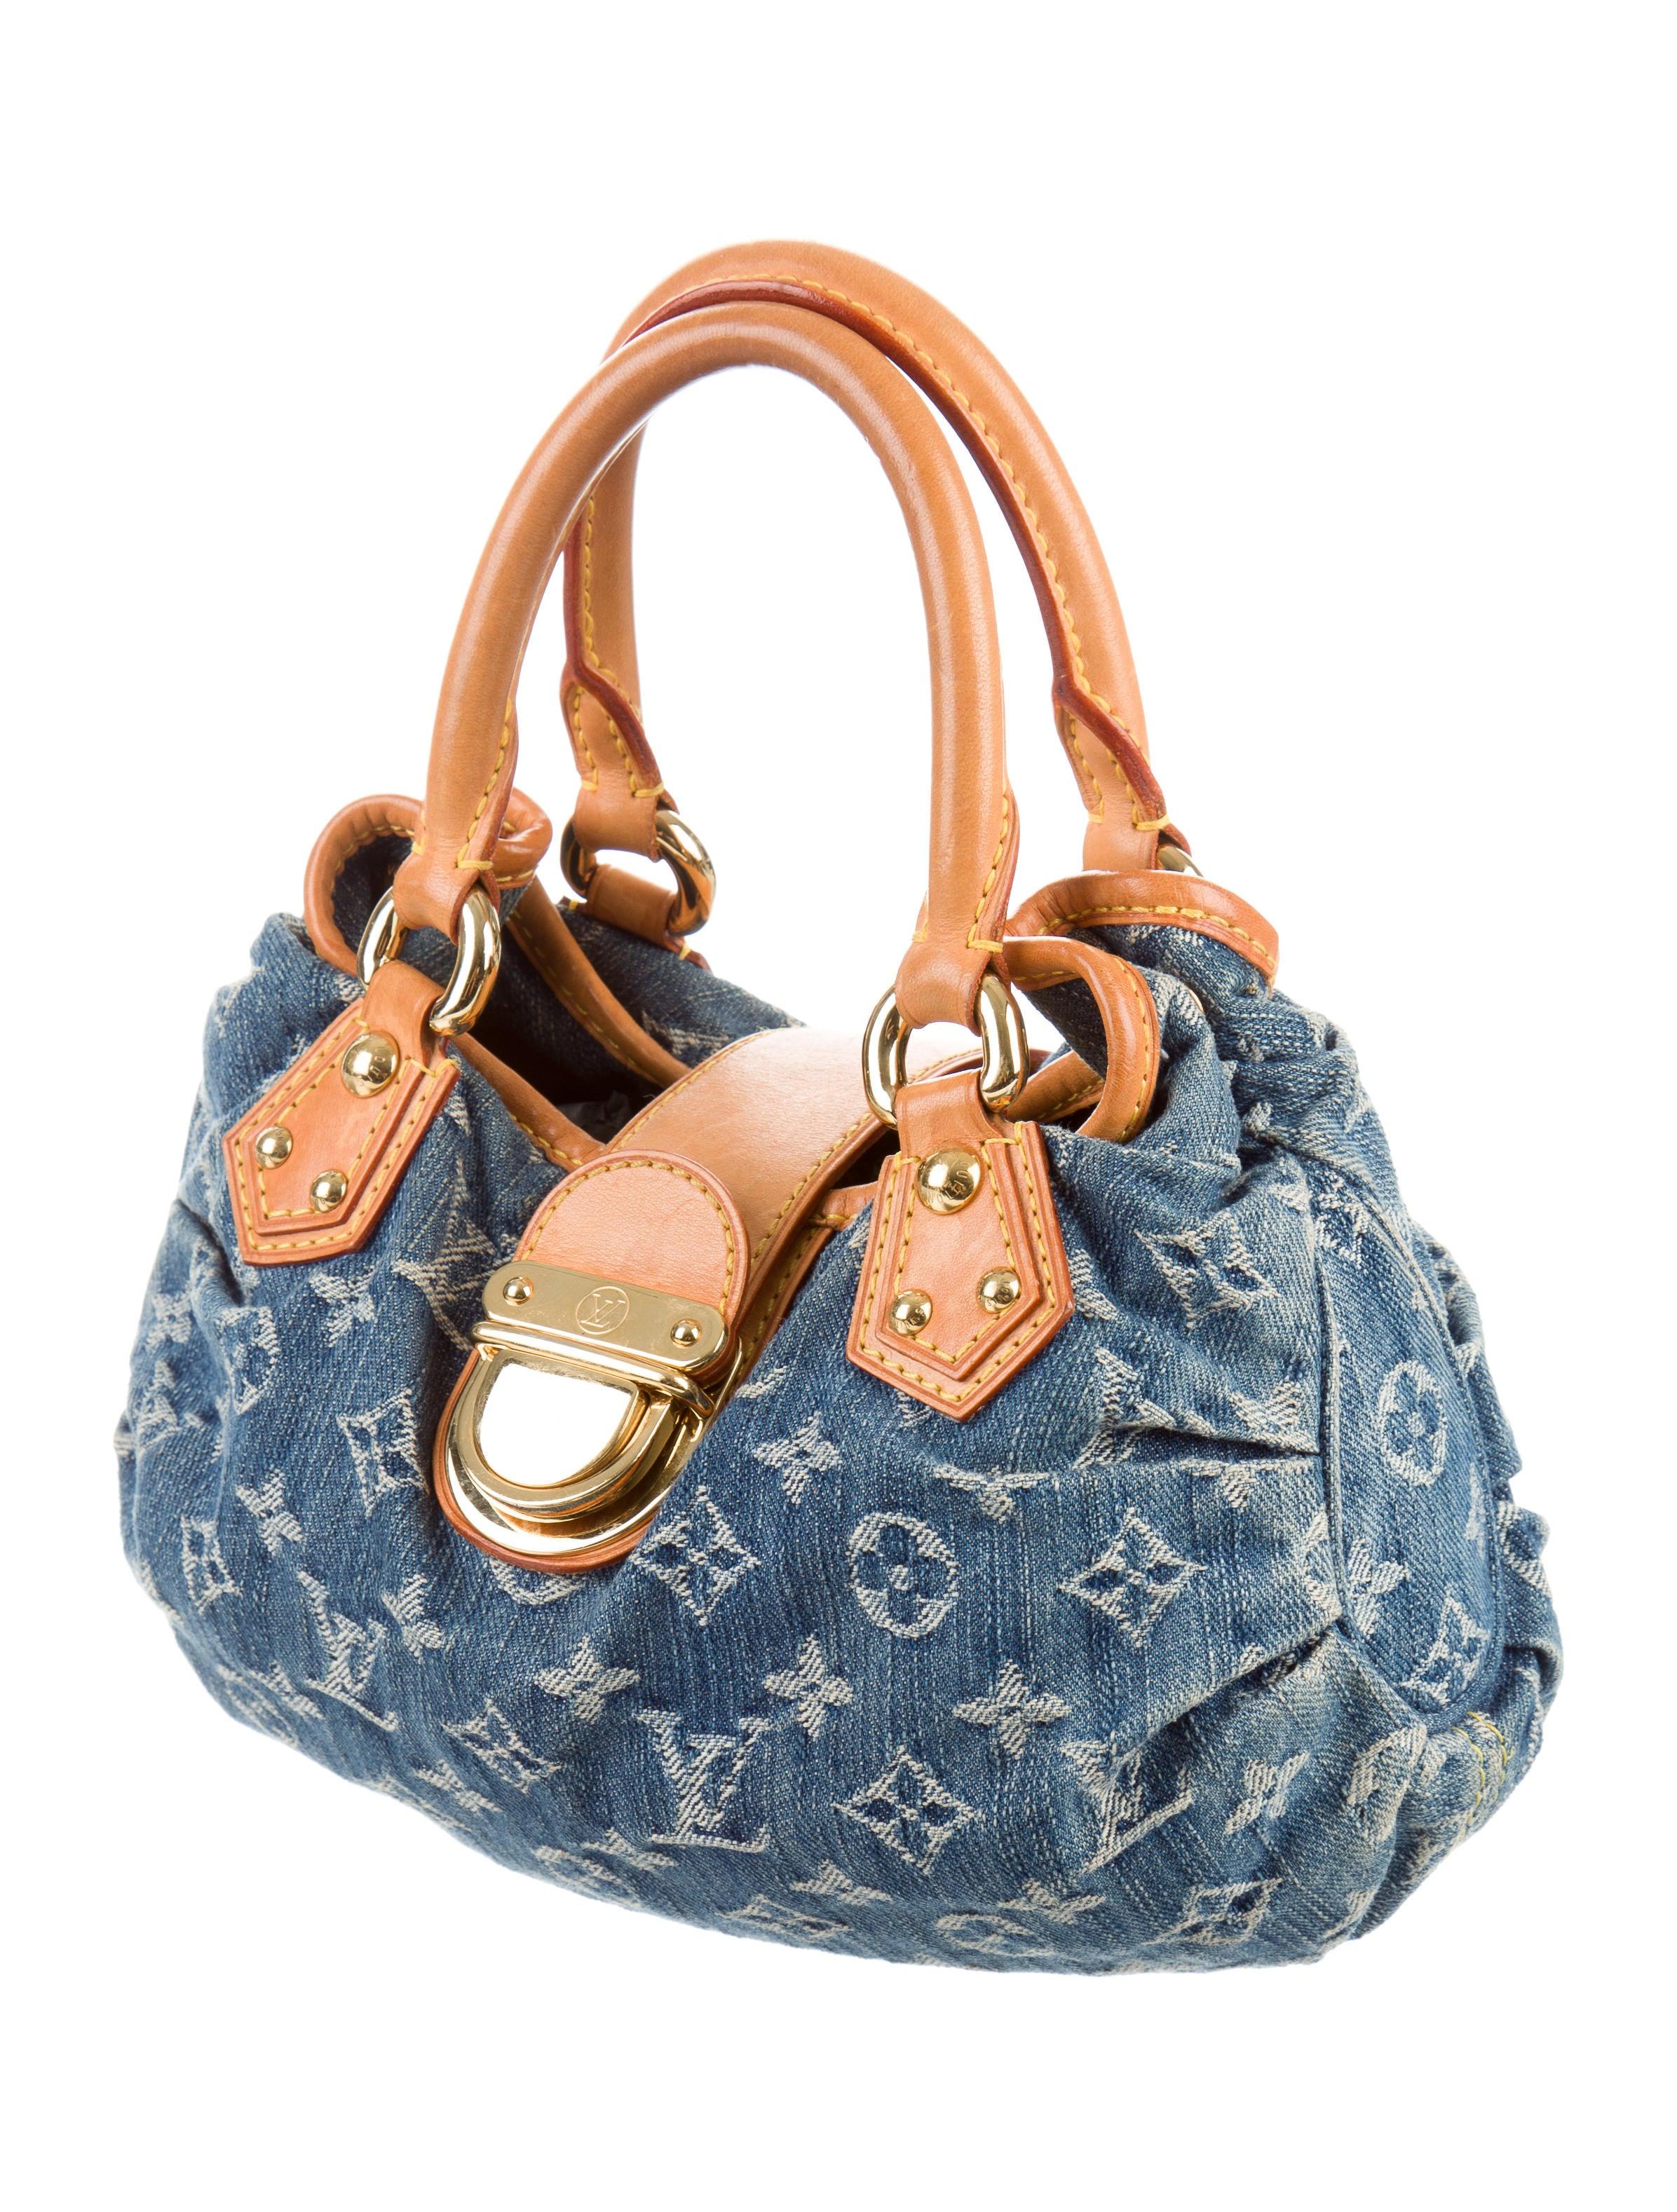 Louis Vuitton Monogram Denim Pleaty Bag - Handbags - LOU109713 | The RealReal